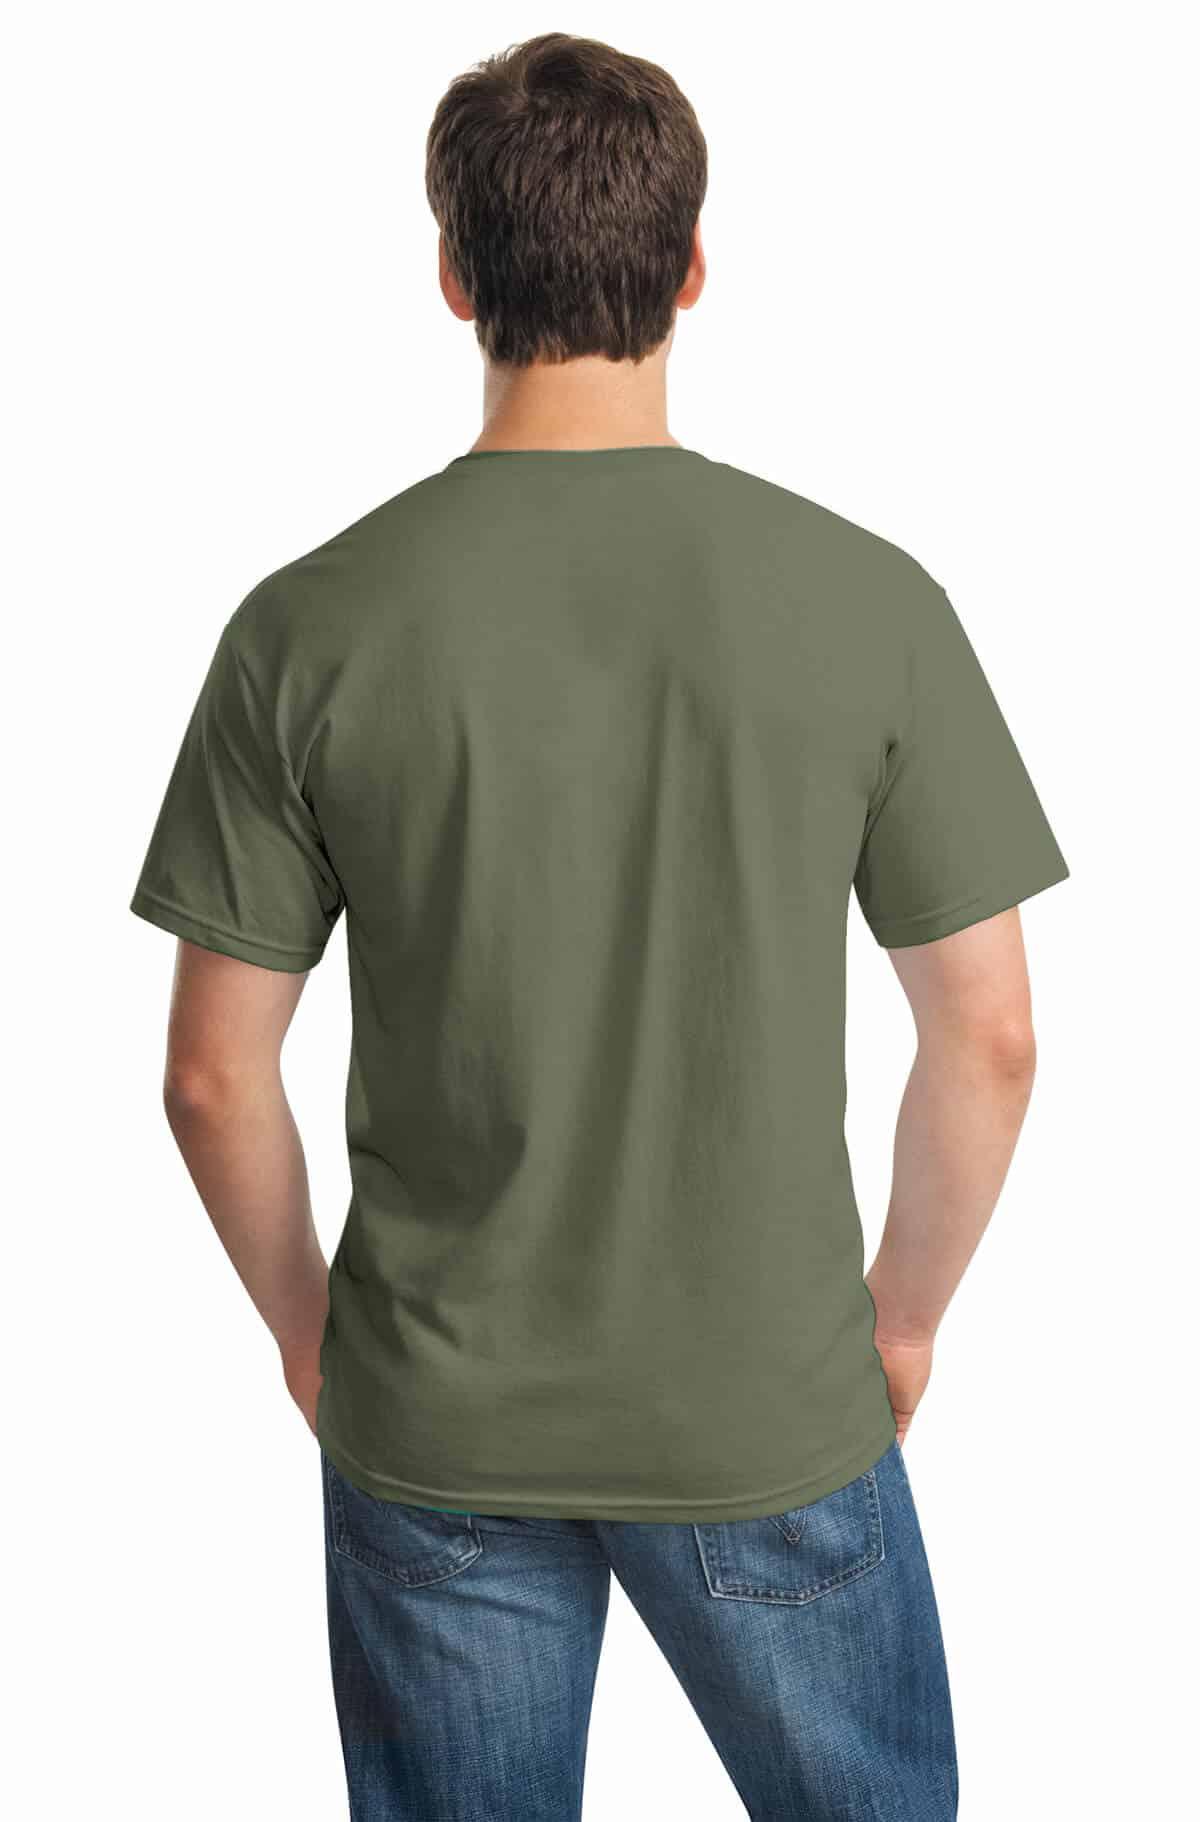 Military Green Tee Back